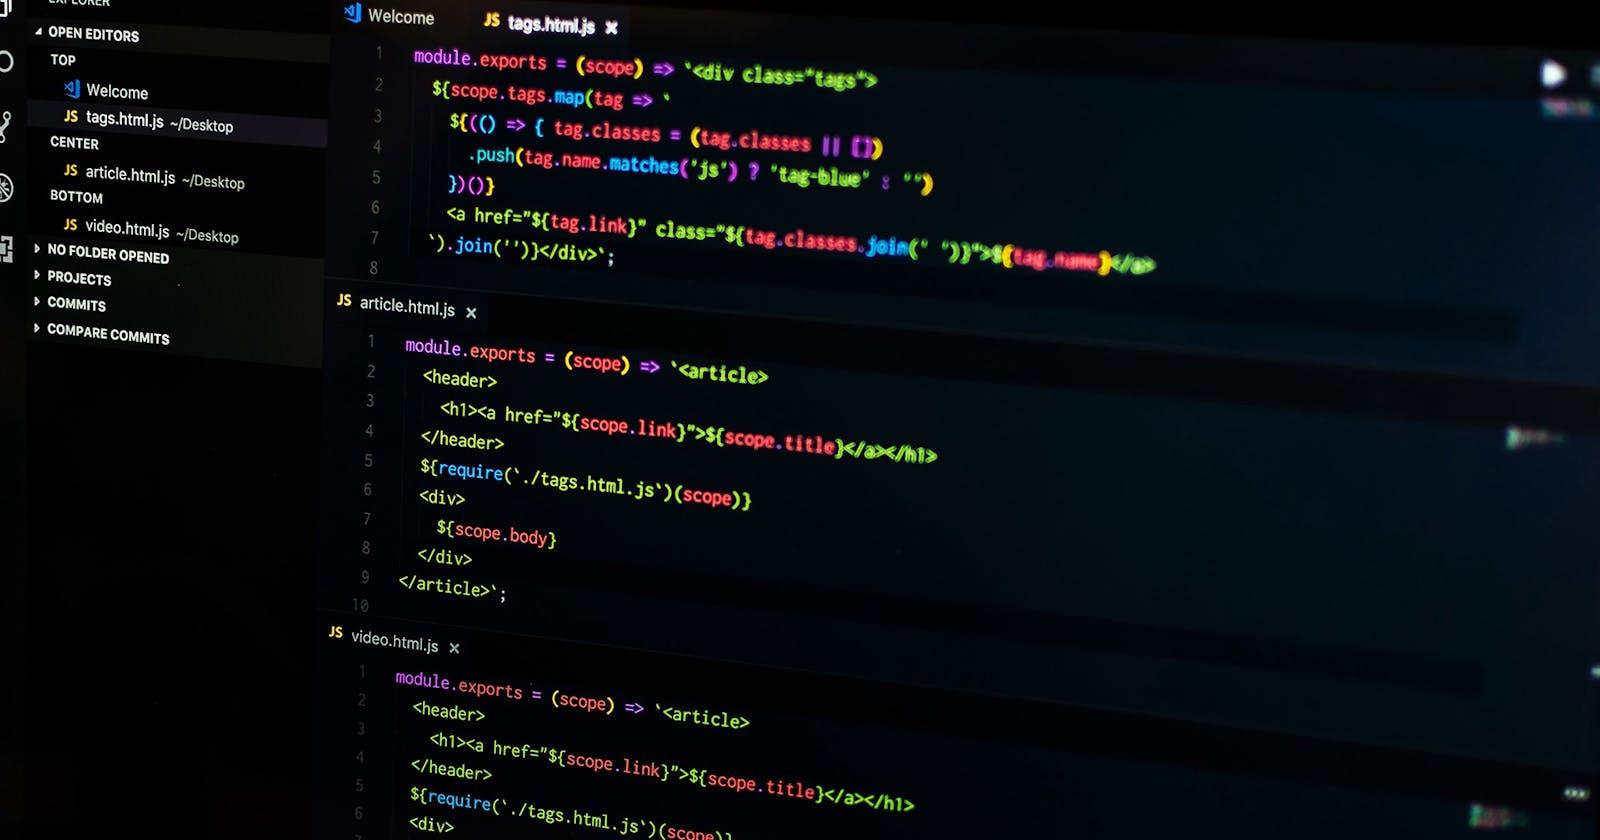 The VSCode Checklist